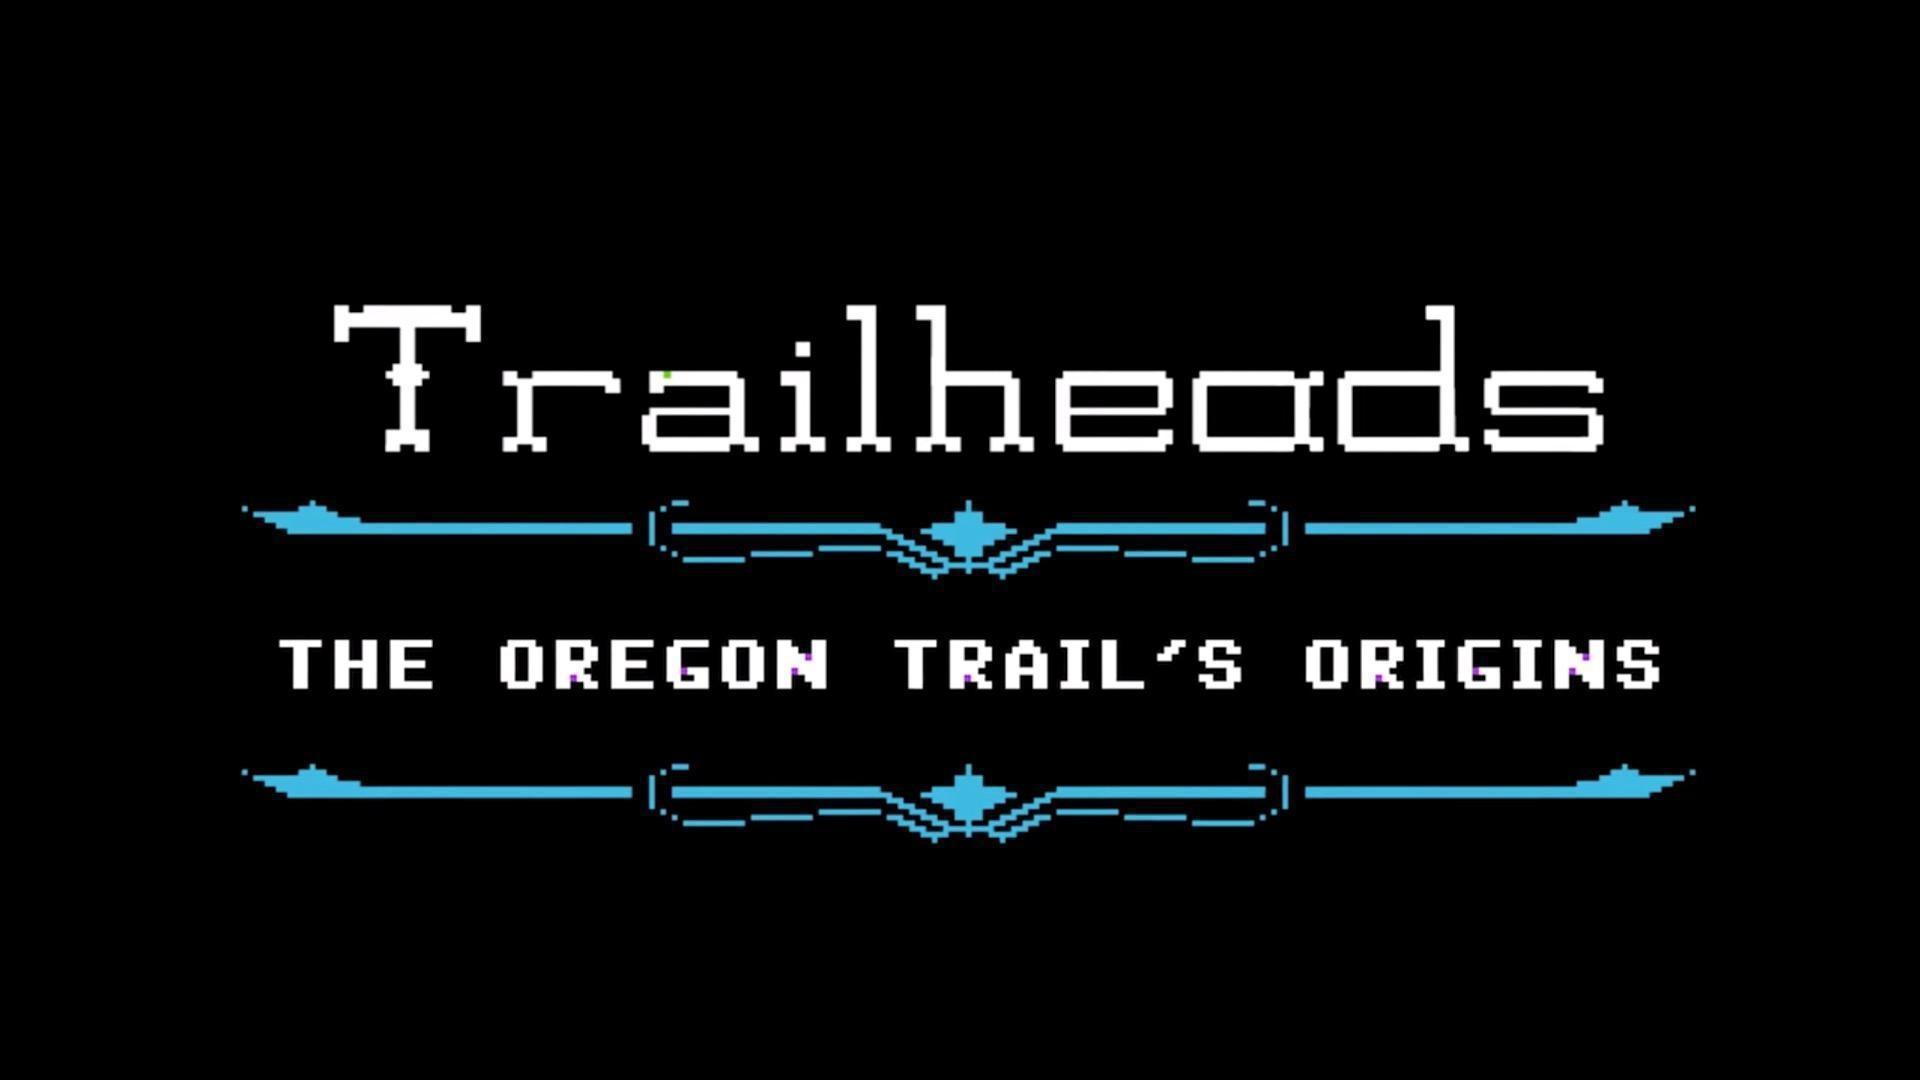 Trailheads: The Oregon Trail's Origins